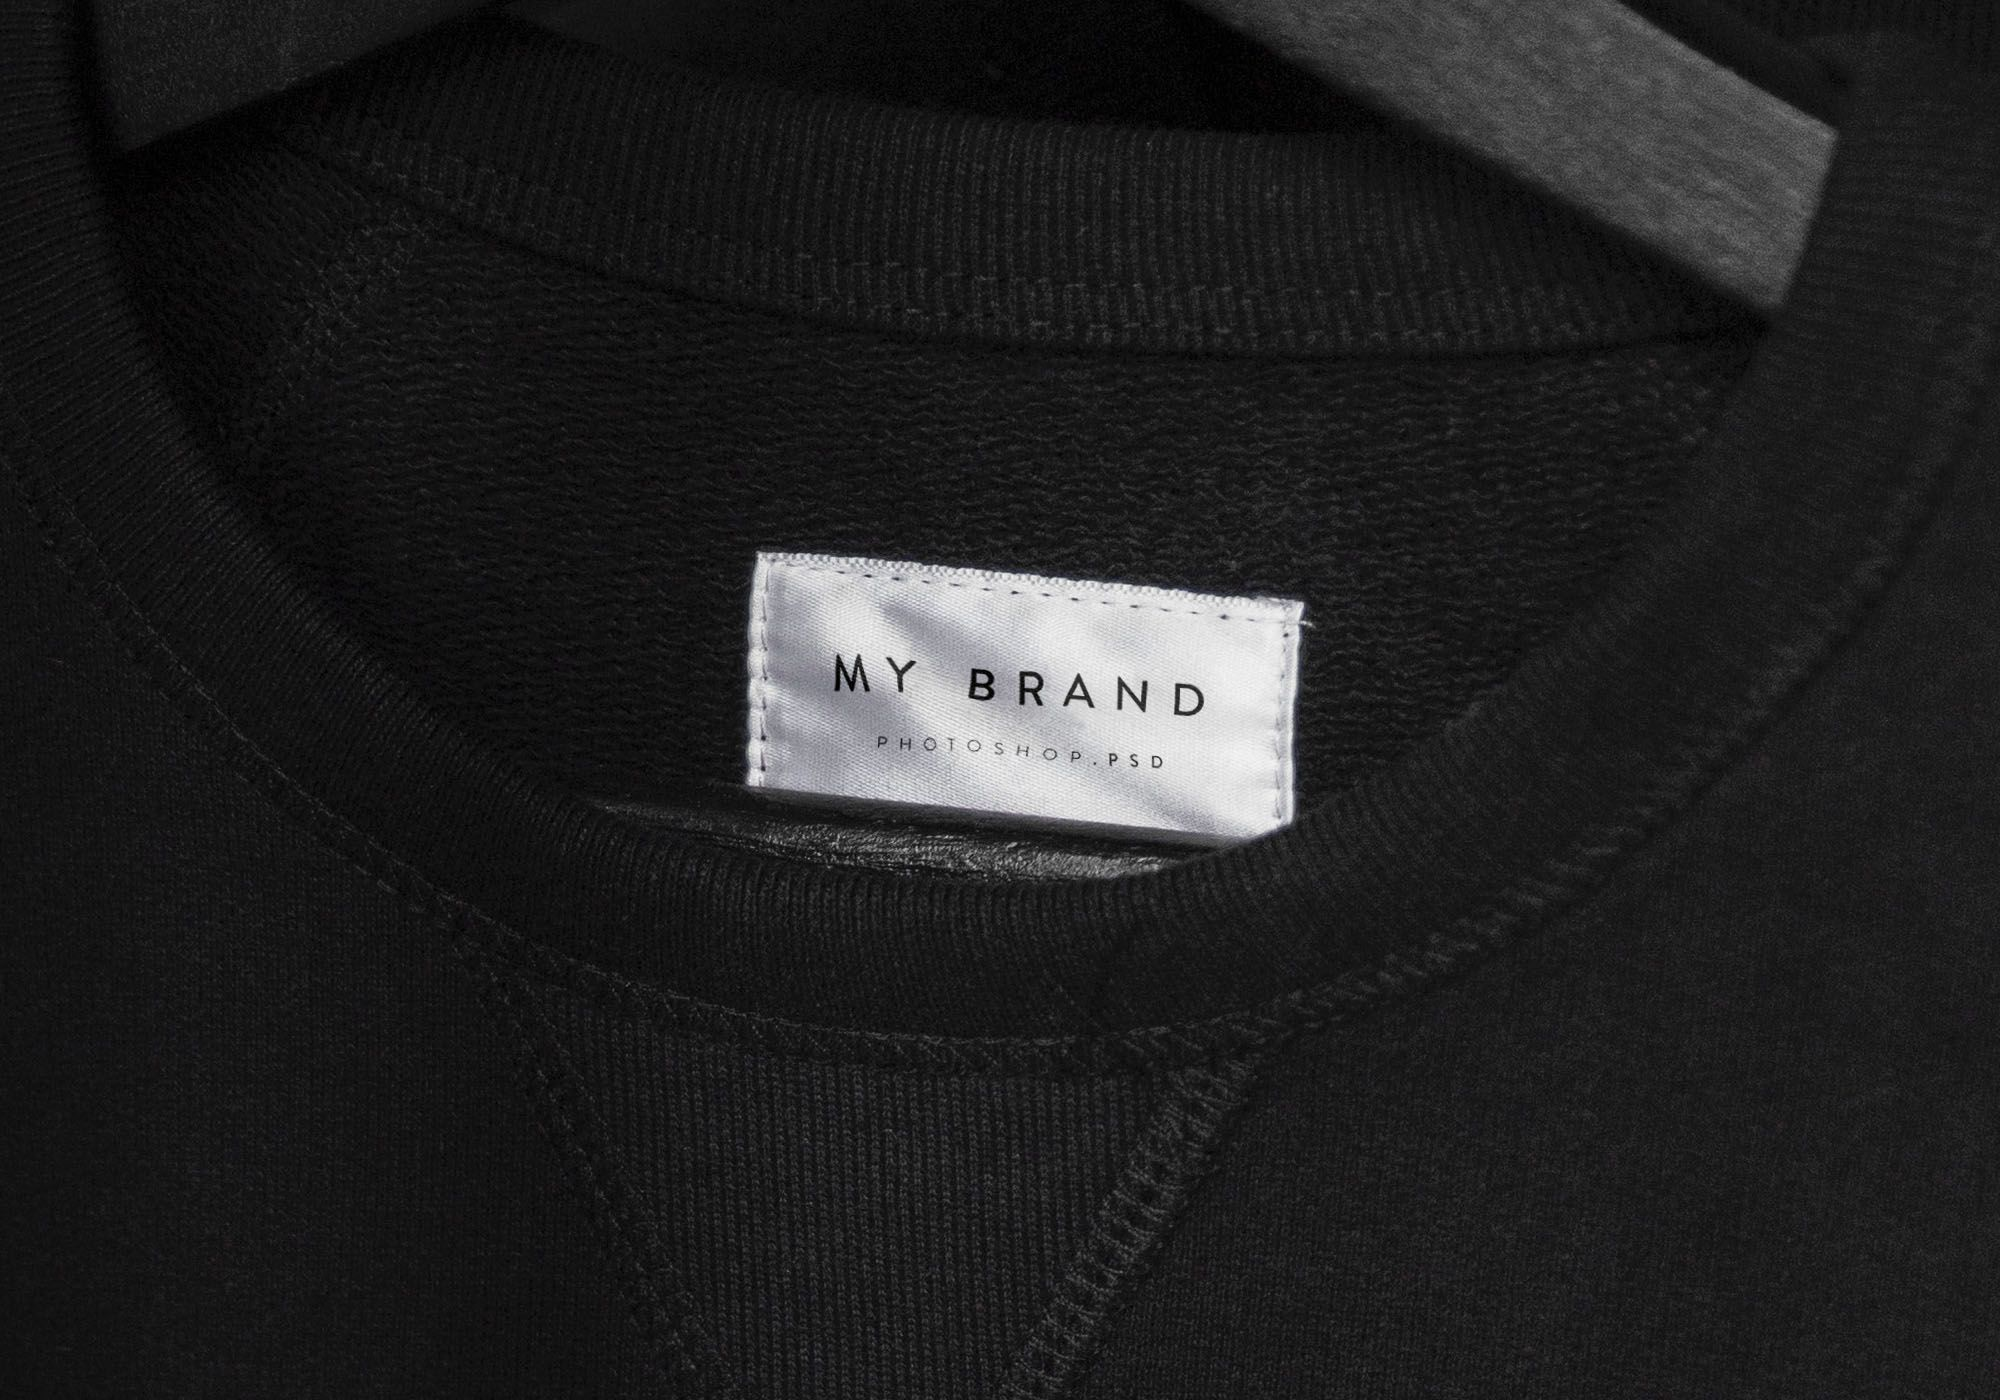 Download Clothing Label Mockup Clothing Labels Clothes Mockup Free Clothing Mockup